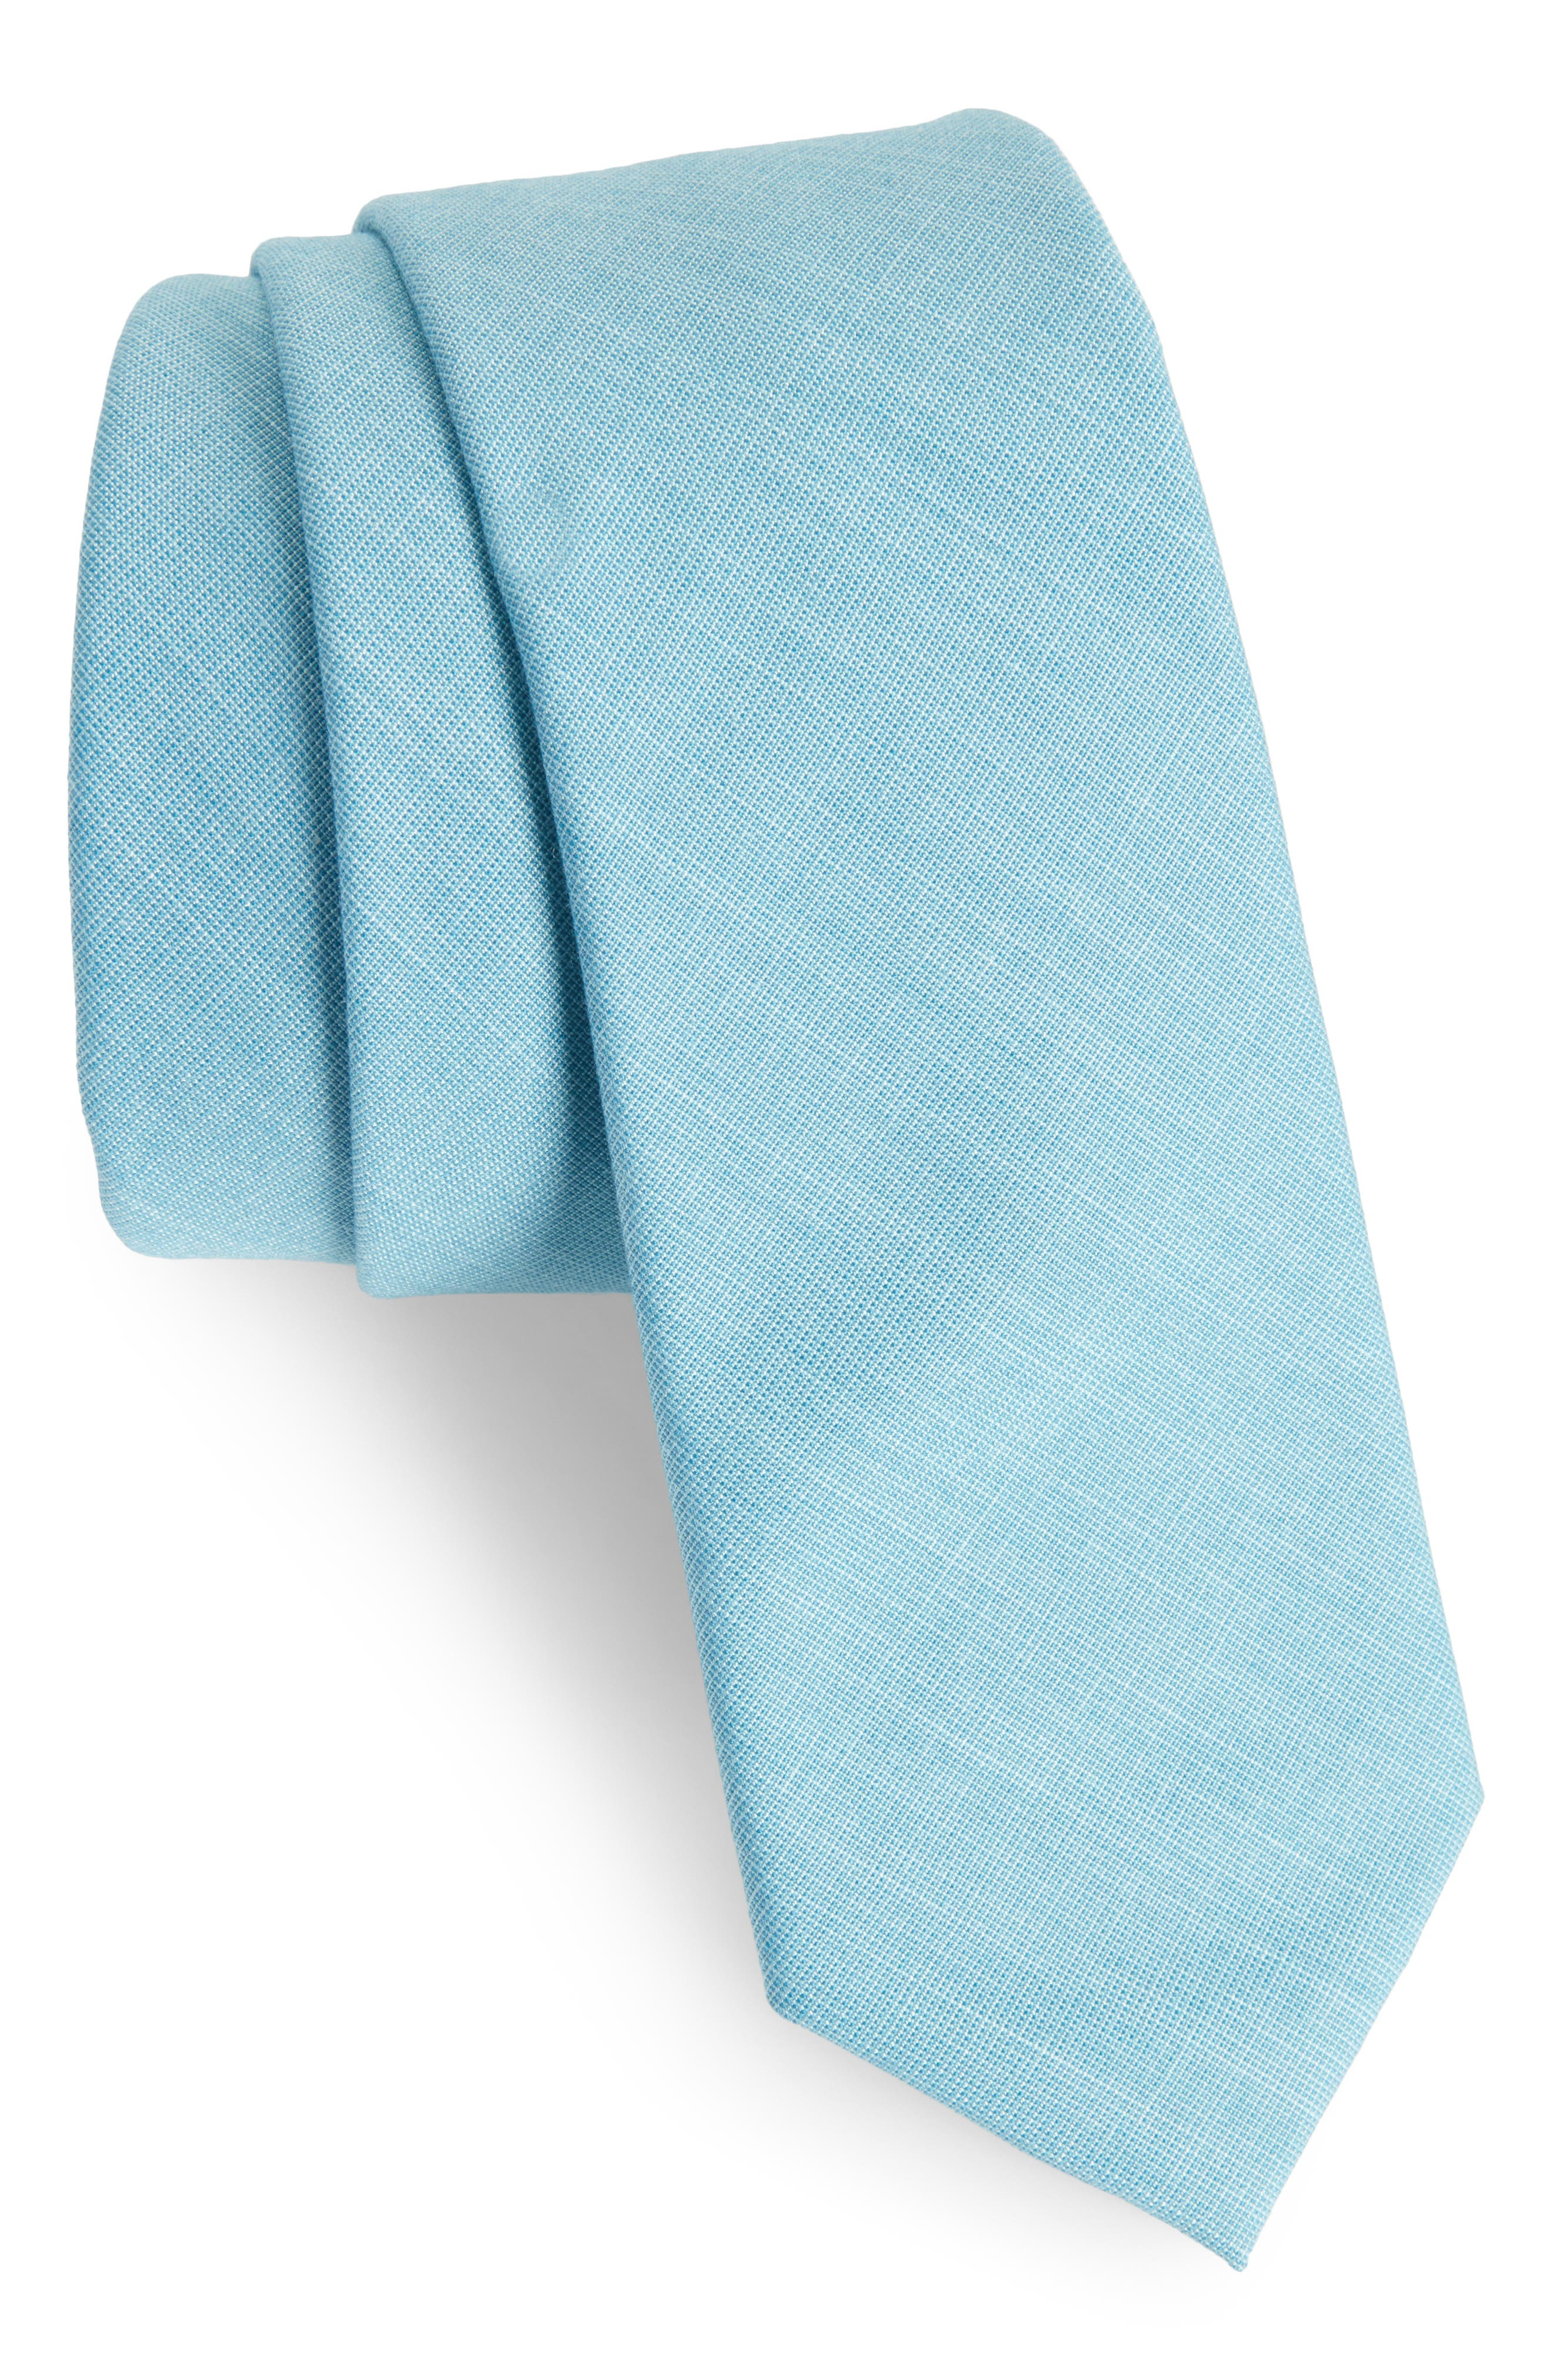 Jeffry Solid Skinny Tie,                         Main,                         color, 450